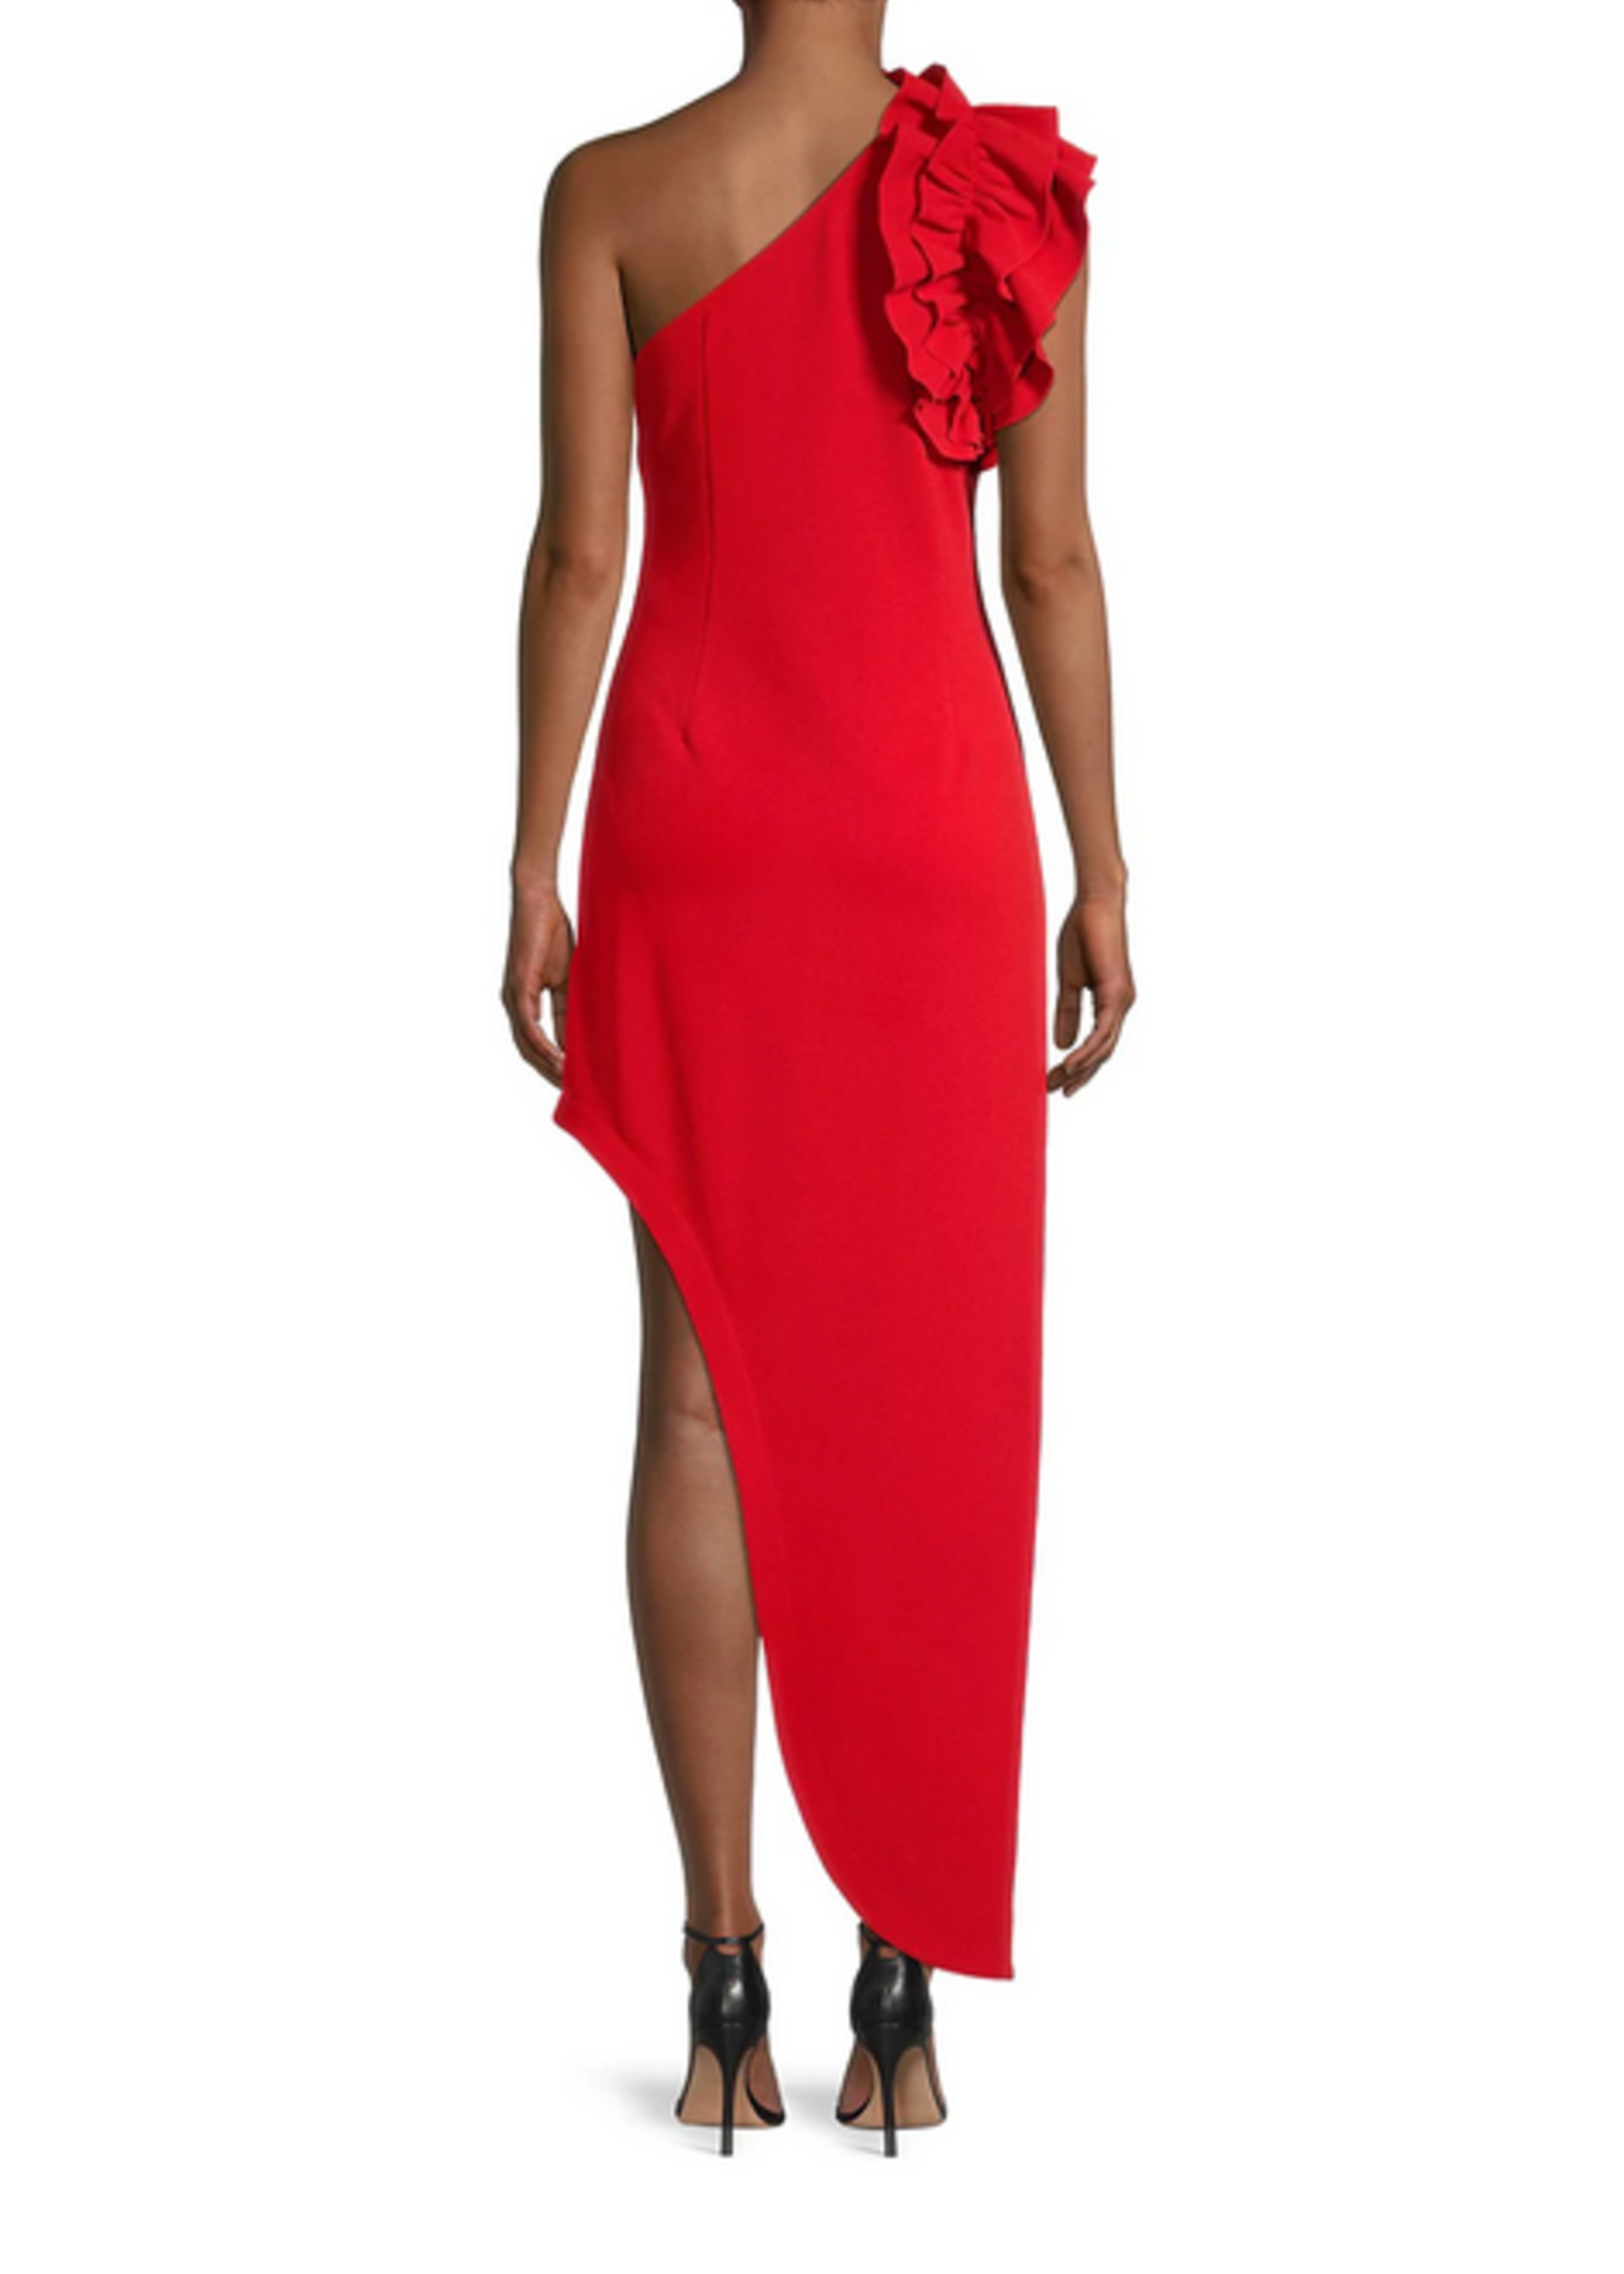 Elitaire Boutique Womanism Dress in Scarlett